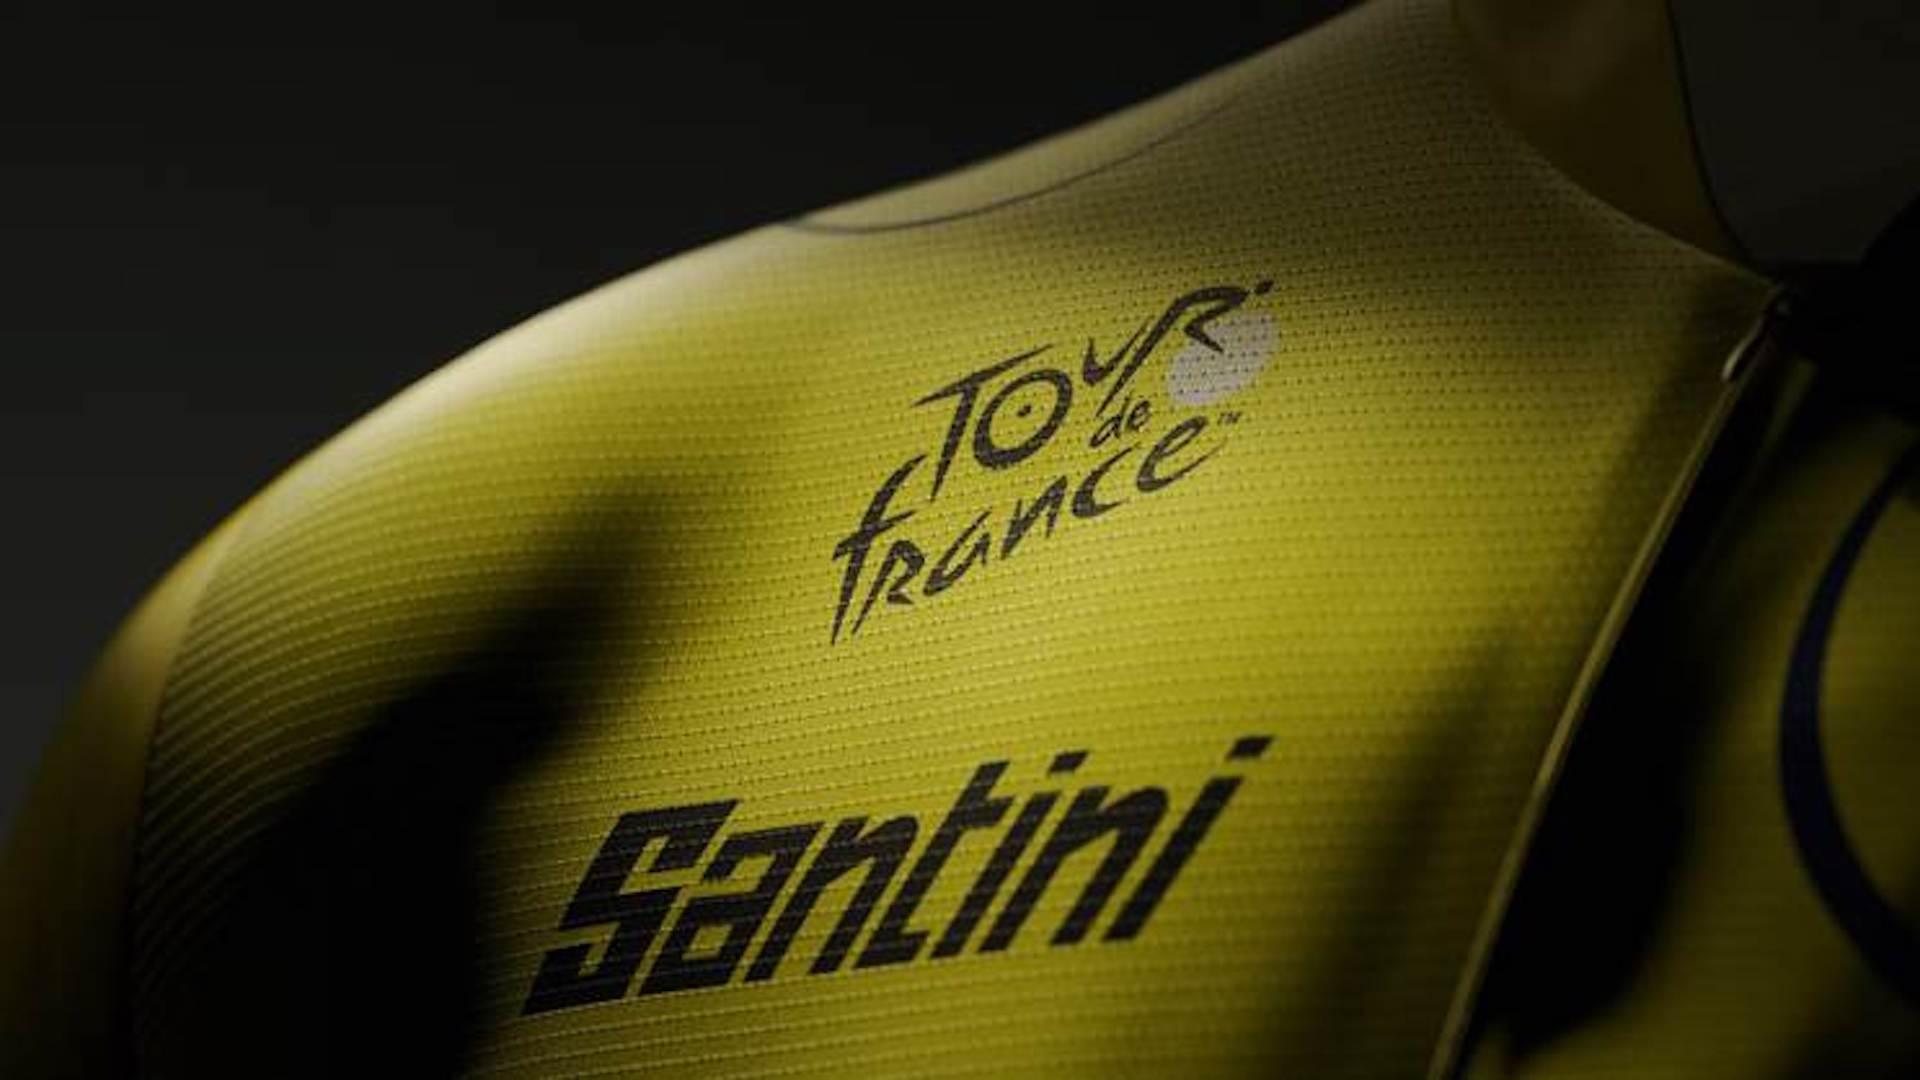 2022 maillot jaune Santini